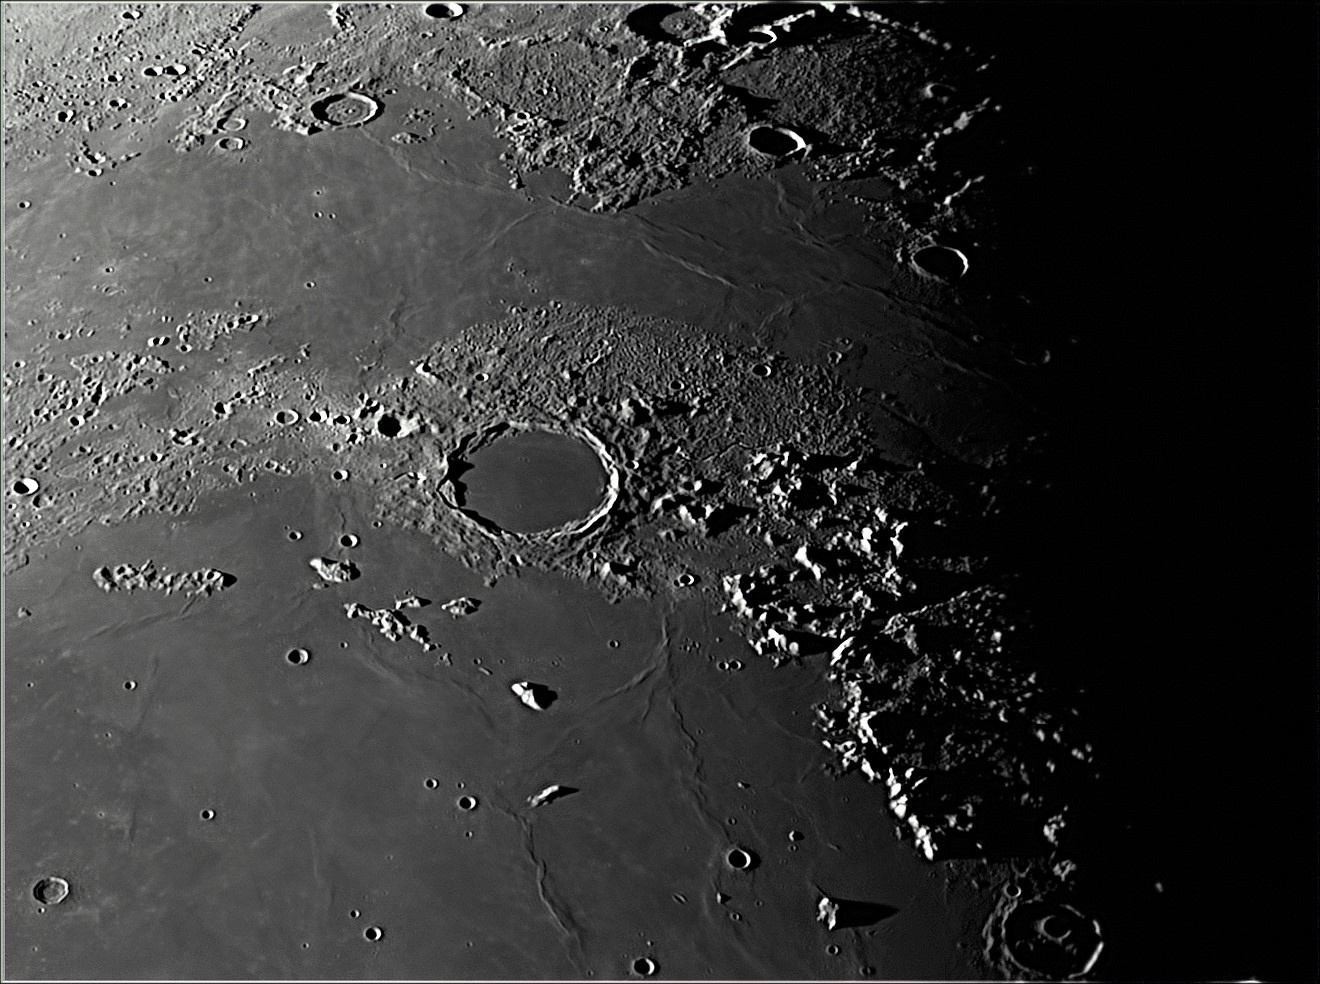 Platon Apo 150 2400mm 2019-09-21-0516 (2).jpg